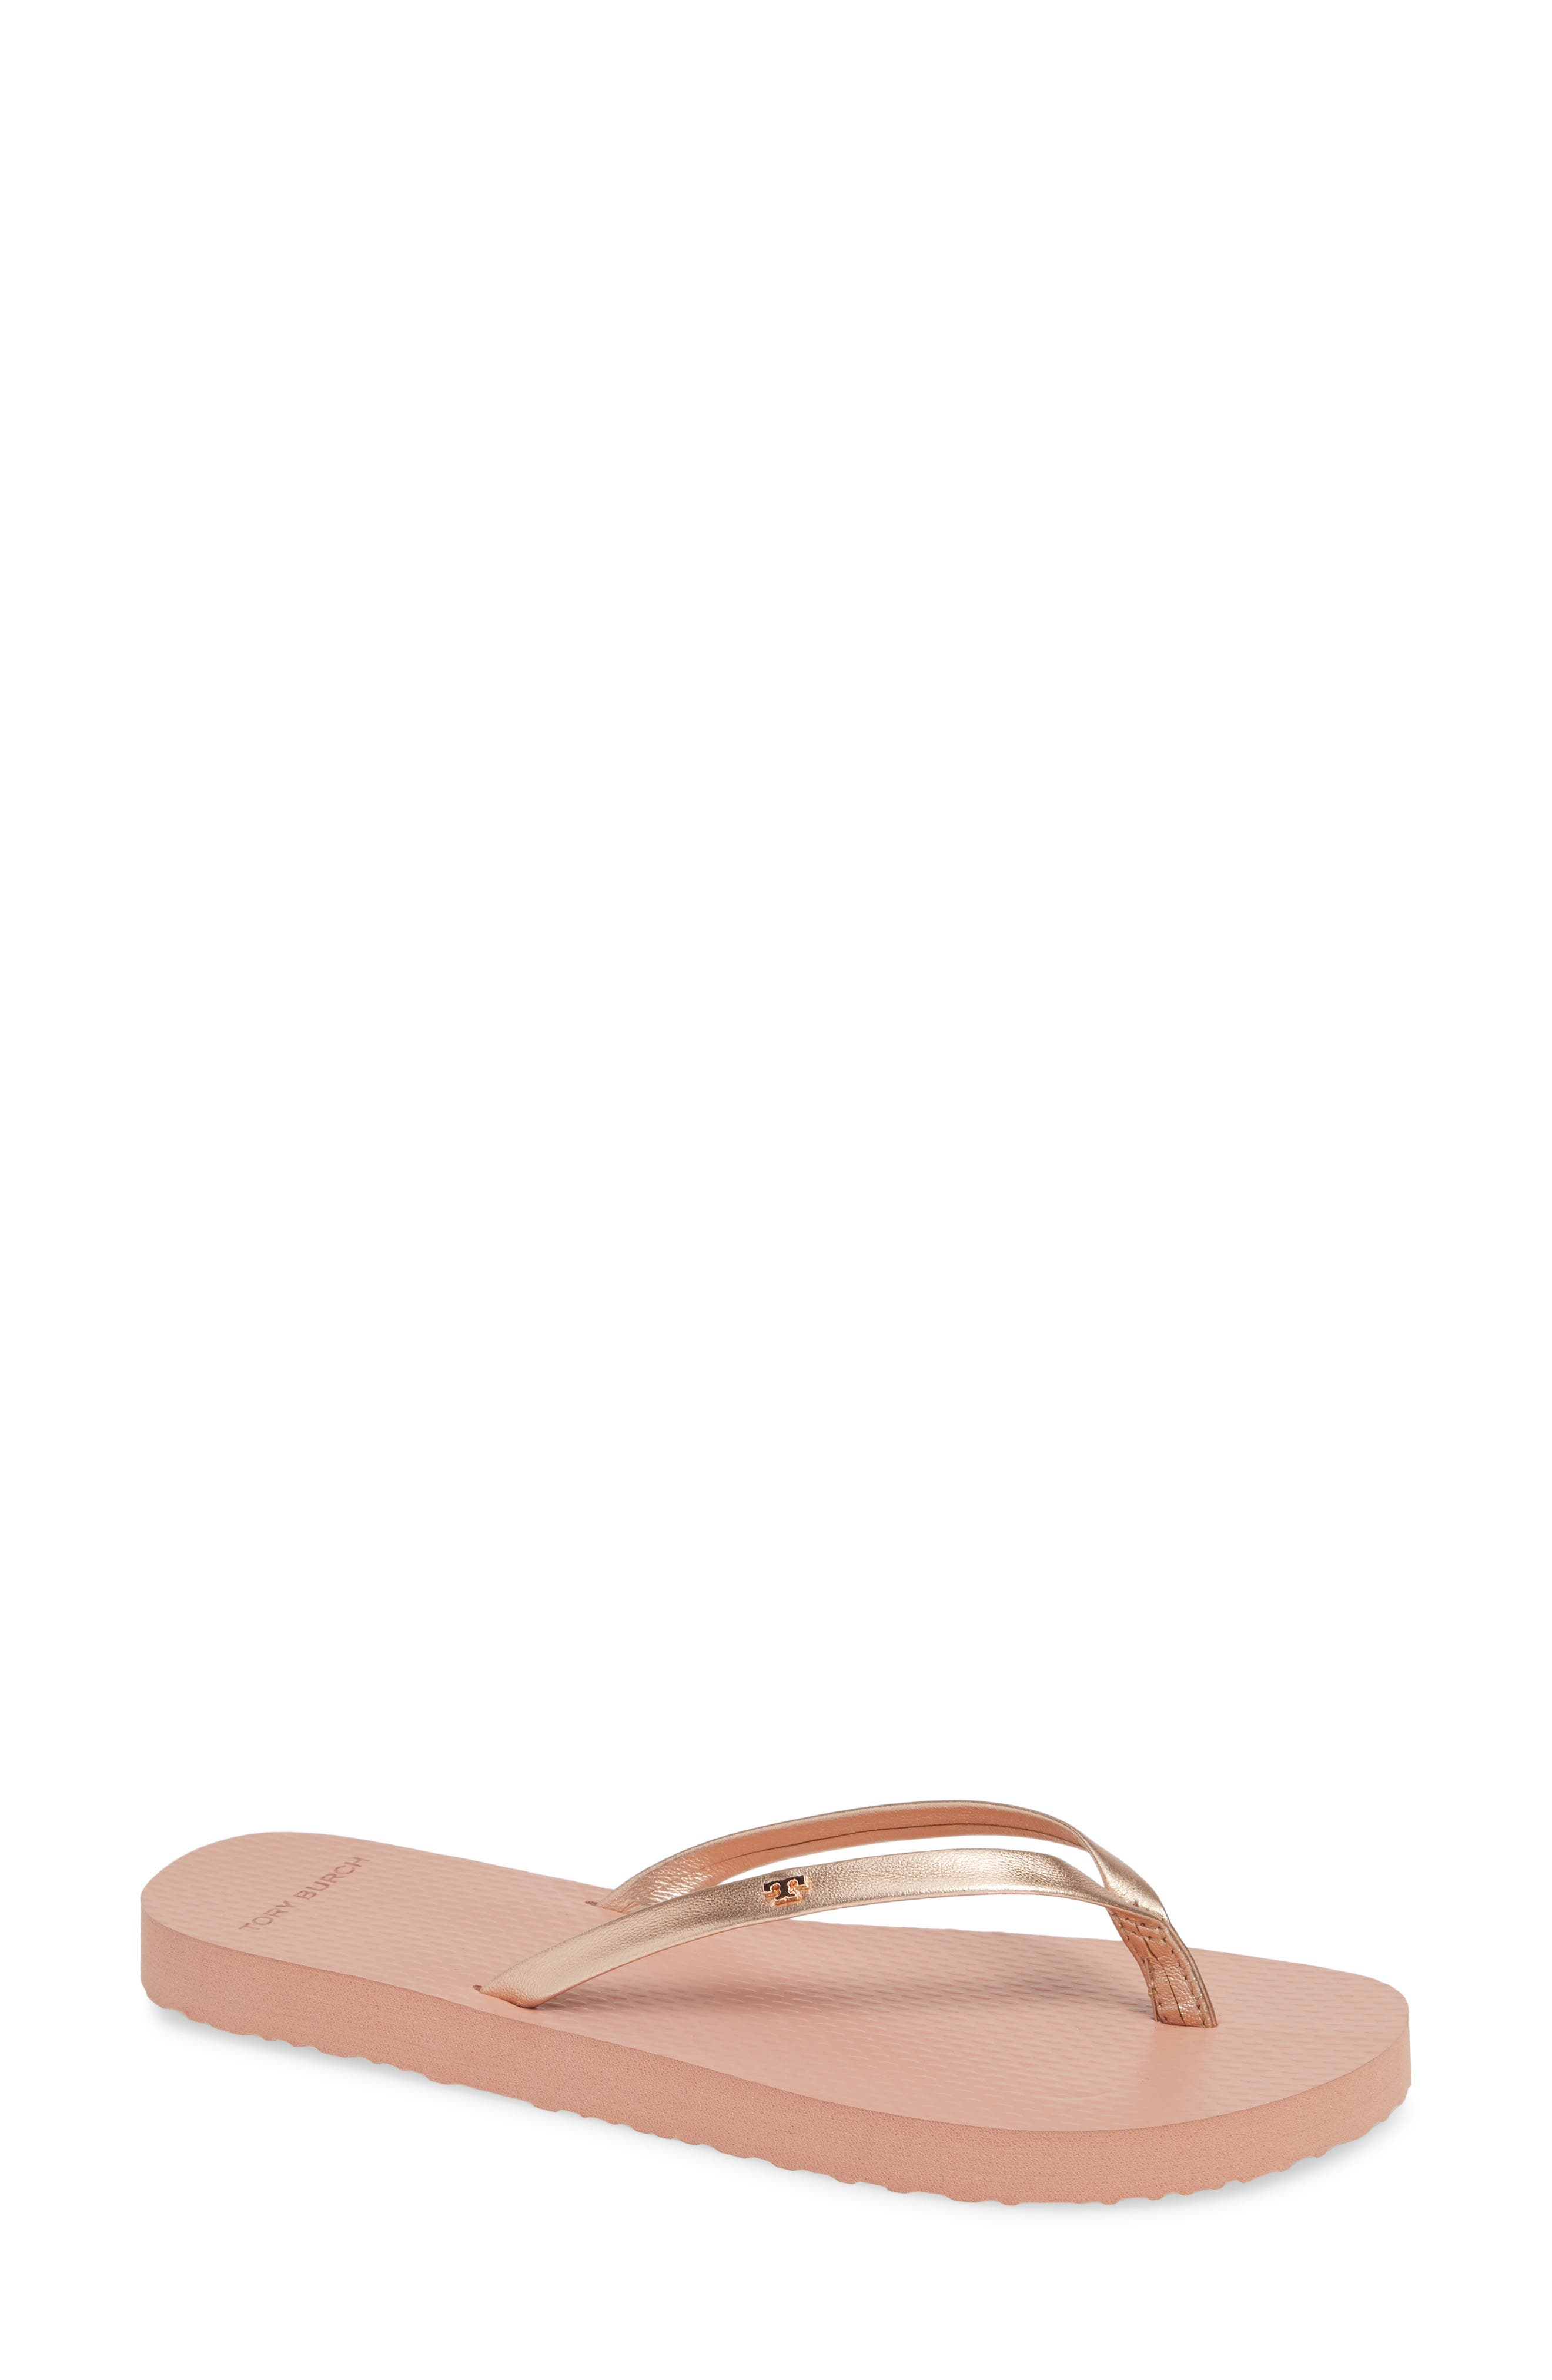 Metallic Leather Flip-Flops in Rose Gold/ Rose